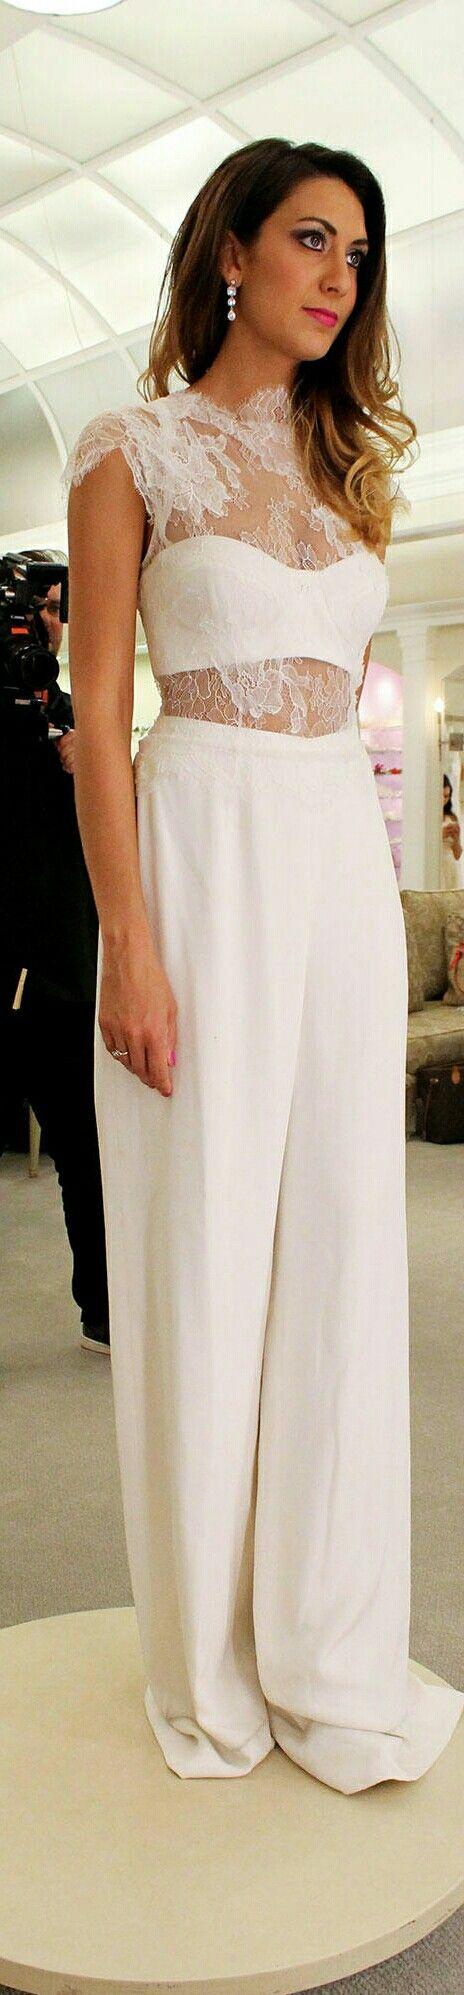 "Natalie Bullard is Trying on a Wedding Jumpsuit for Season 14 - ""The Dress"" - [TLC];April 6, 2016."